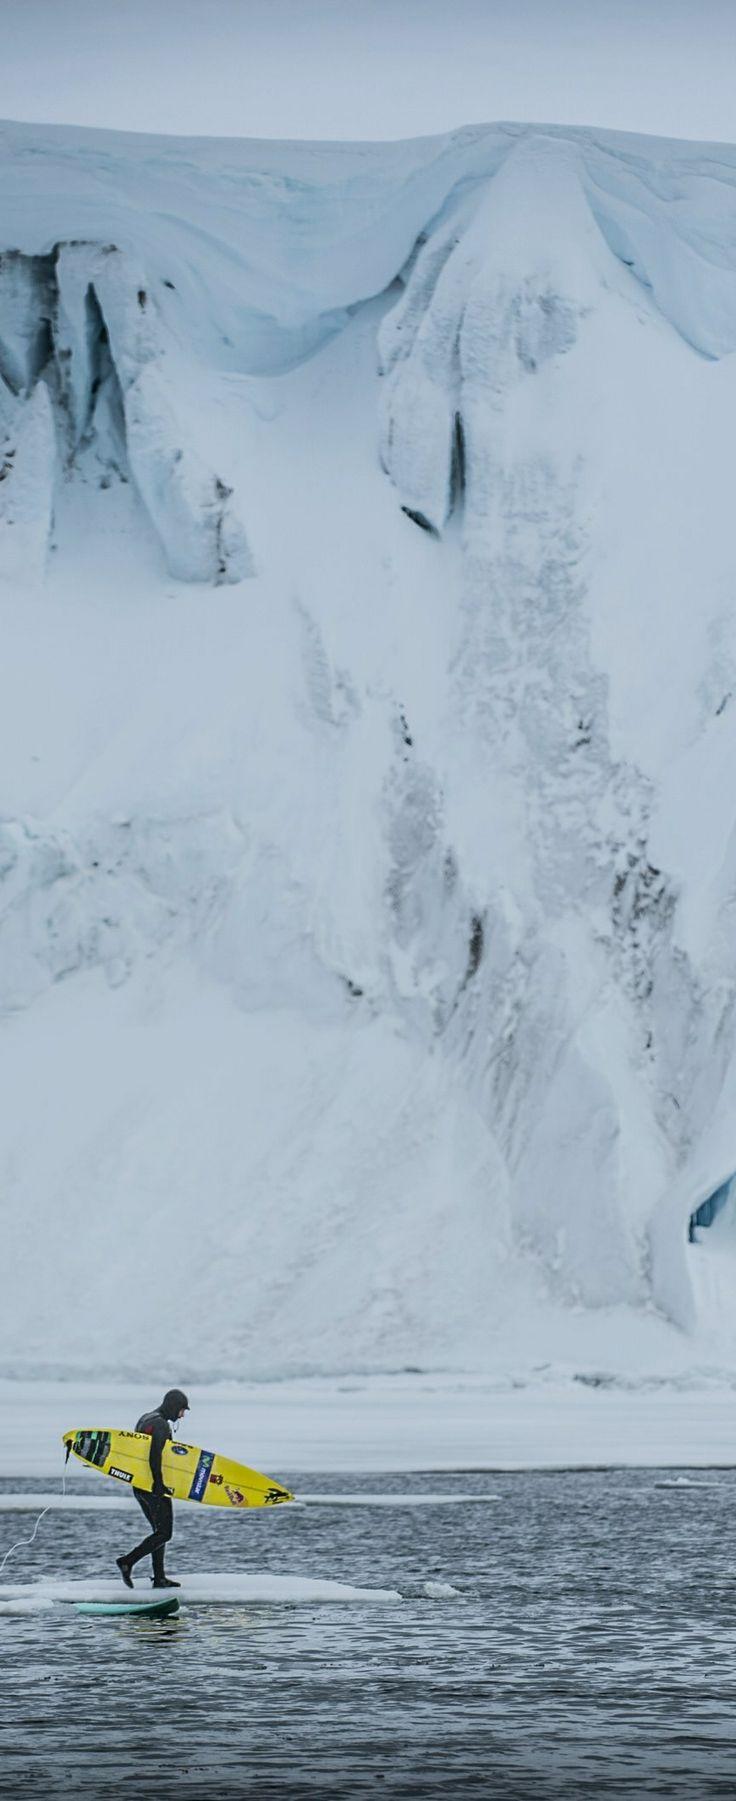 Cold front. Ramon Navarro is Surfing Antarctica. #surf #snow Image: Alfredo Escobar